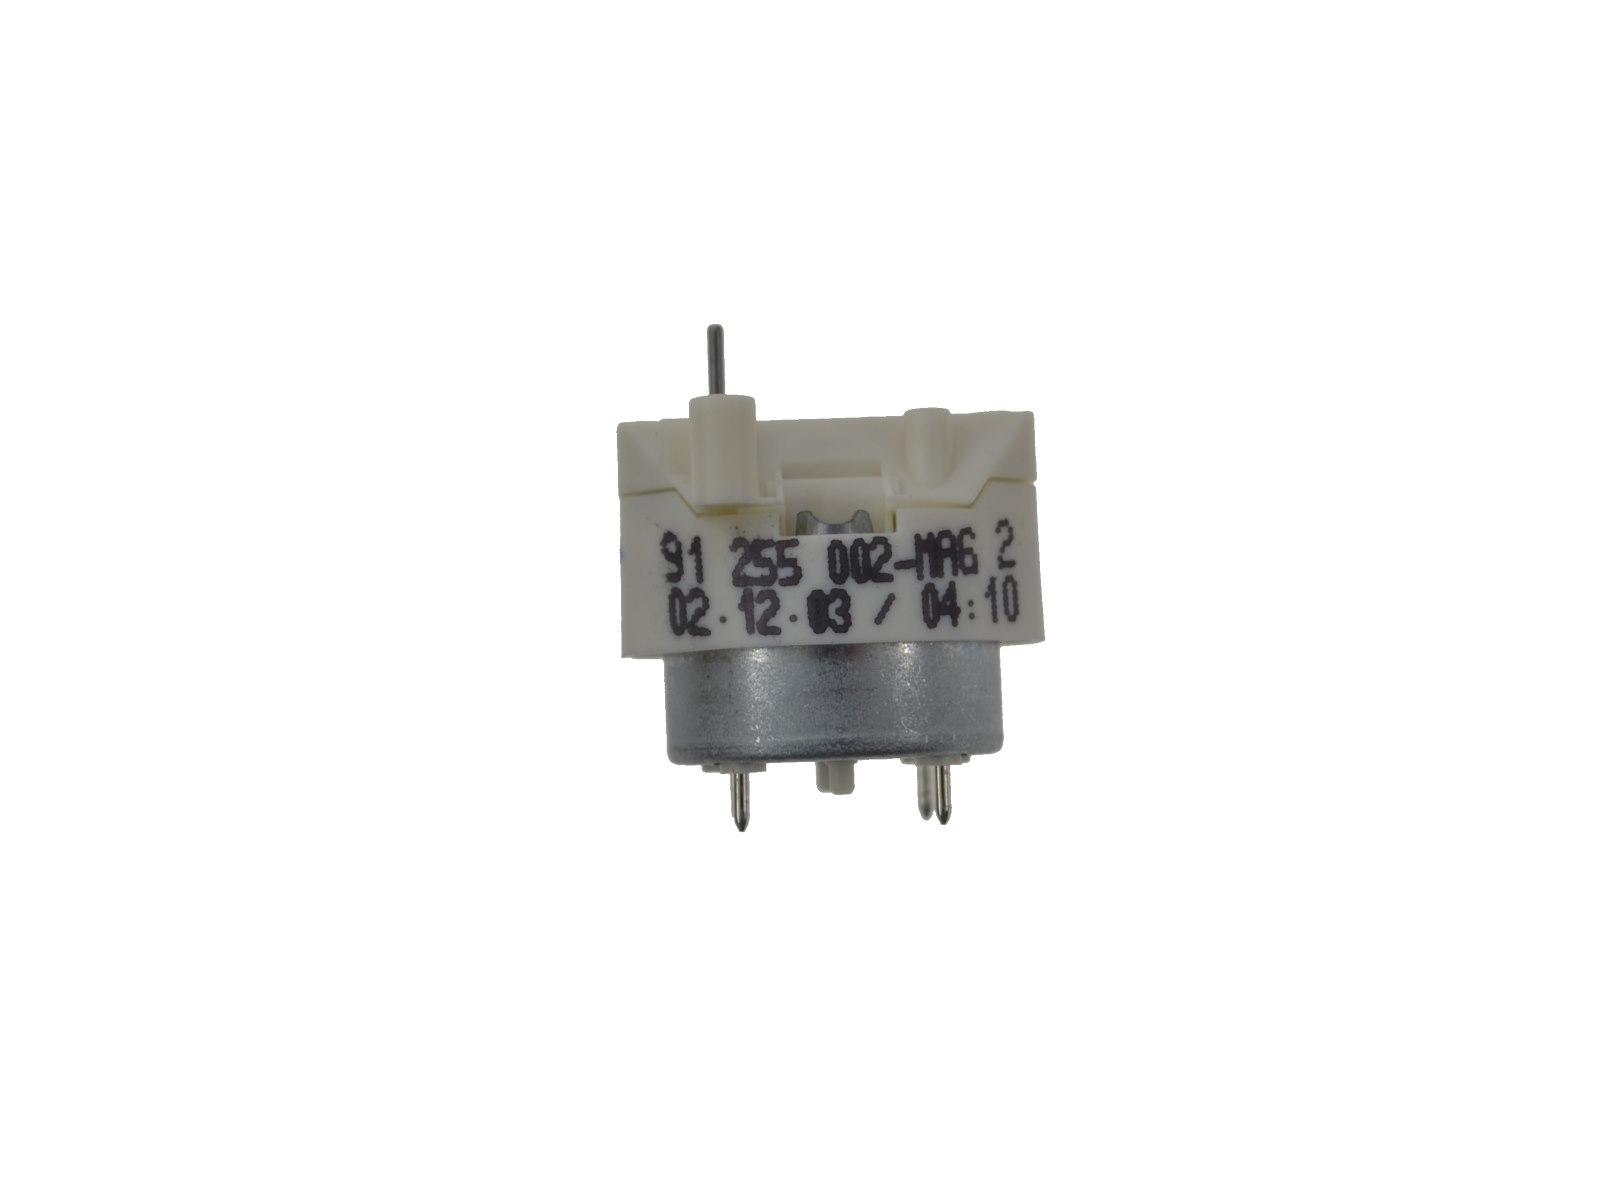 Schrittmotor für Smart fortwo/forfour VDO Kombiinstrument Nr -02